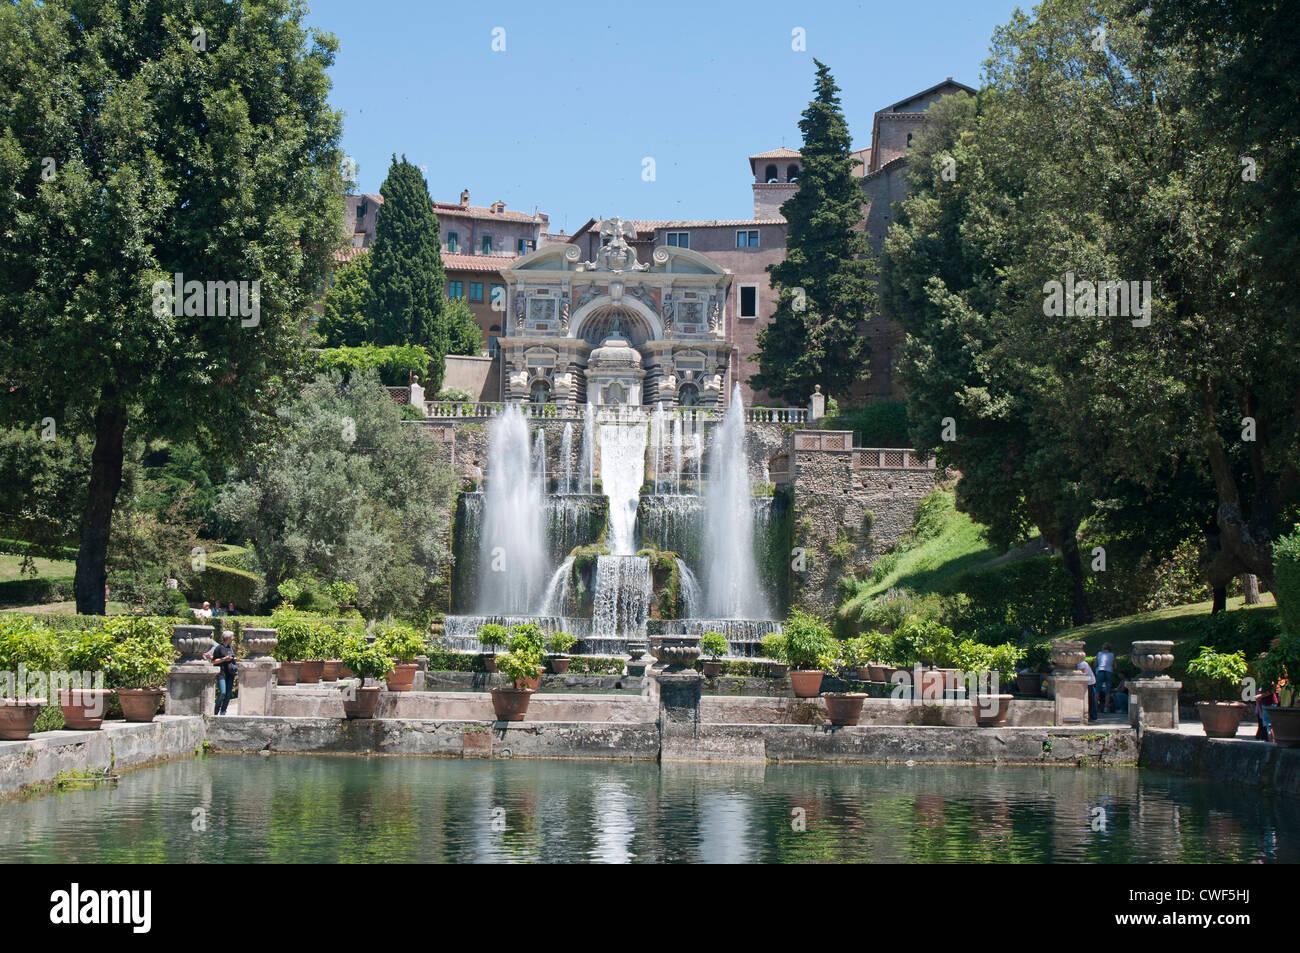 the renaissance gardens of the villa d 39 este tivoli near rome stock photo royalty free image. Black Bedroom Furniture Sets. Home Design Ideas